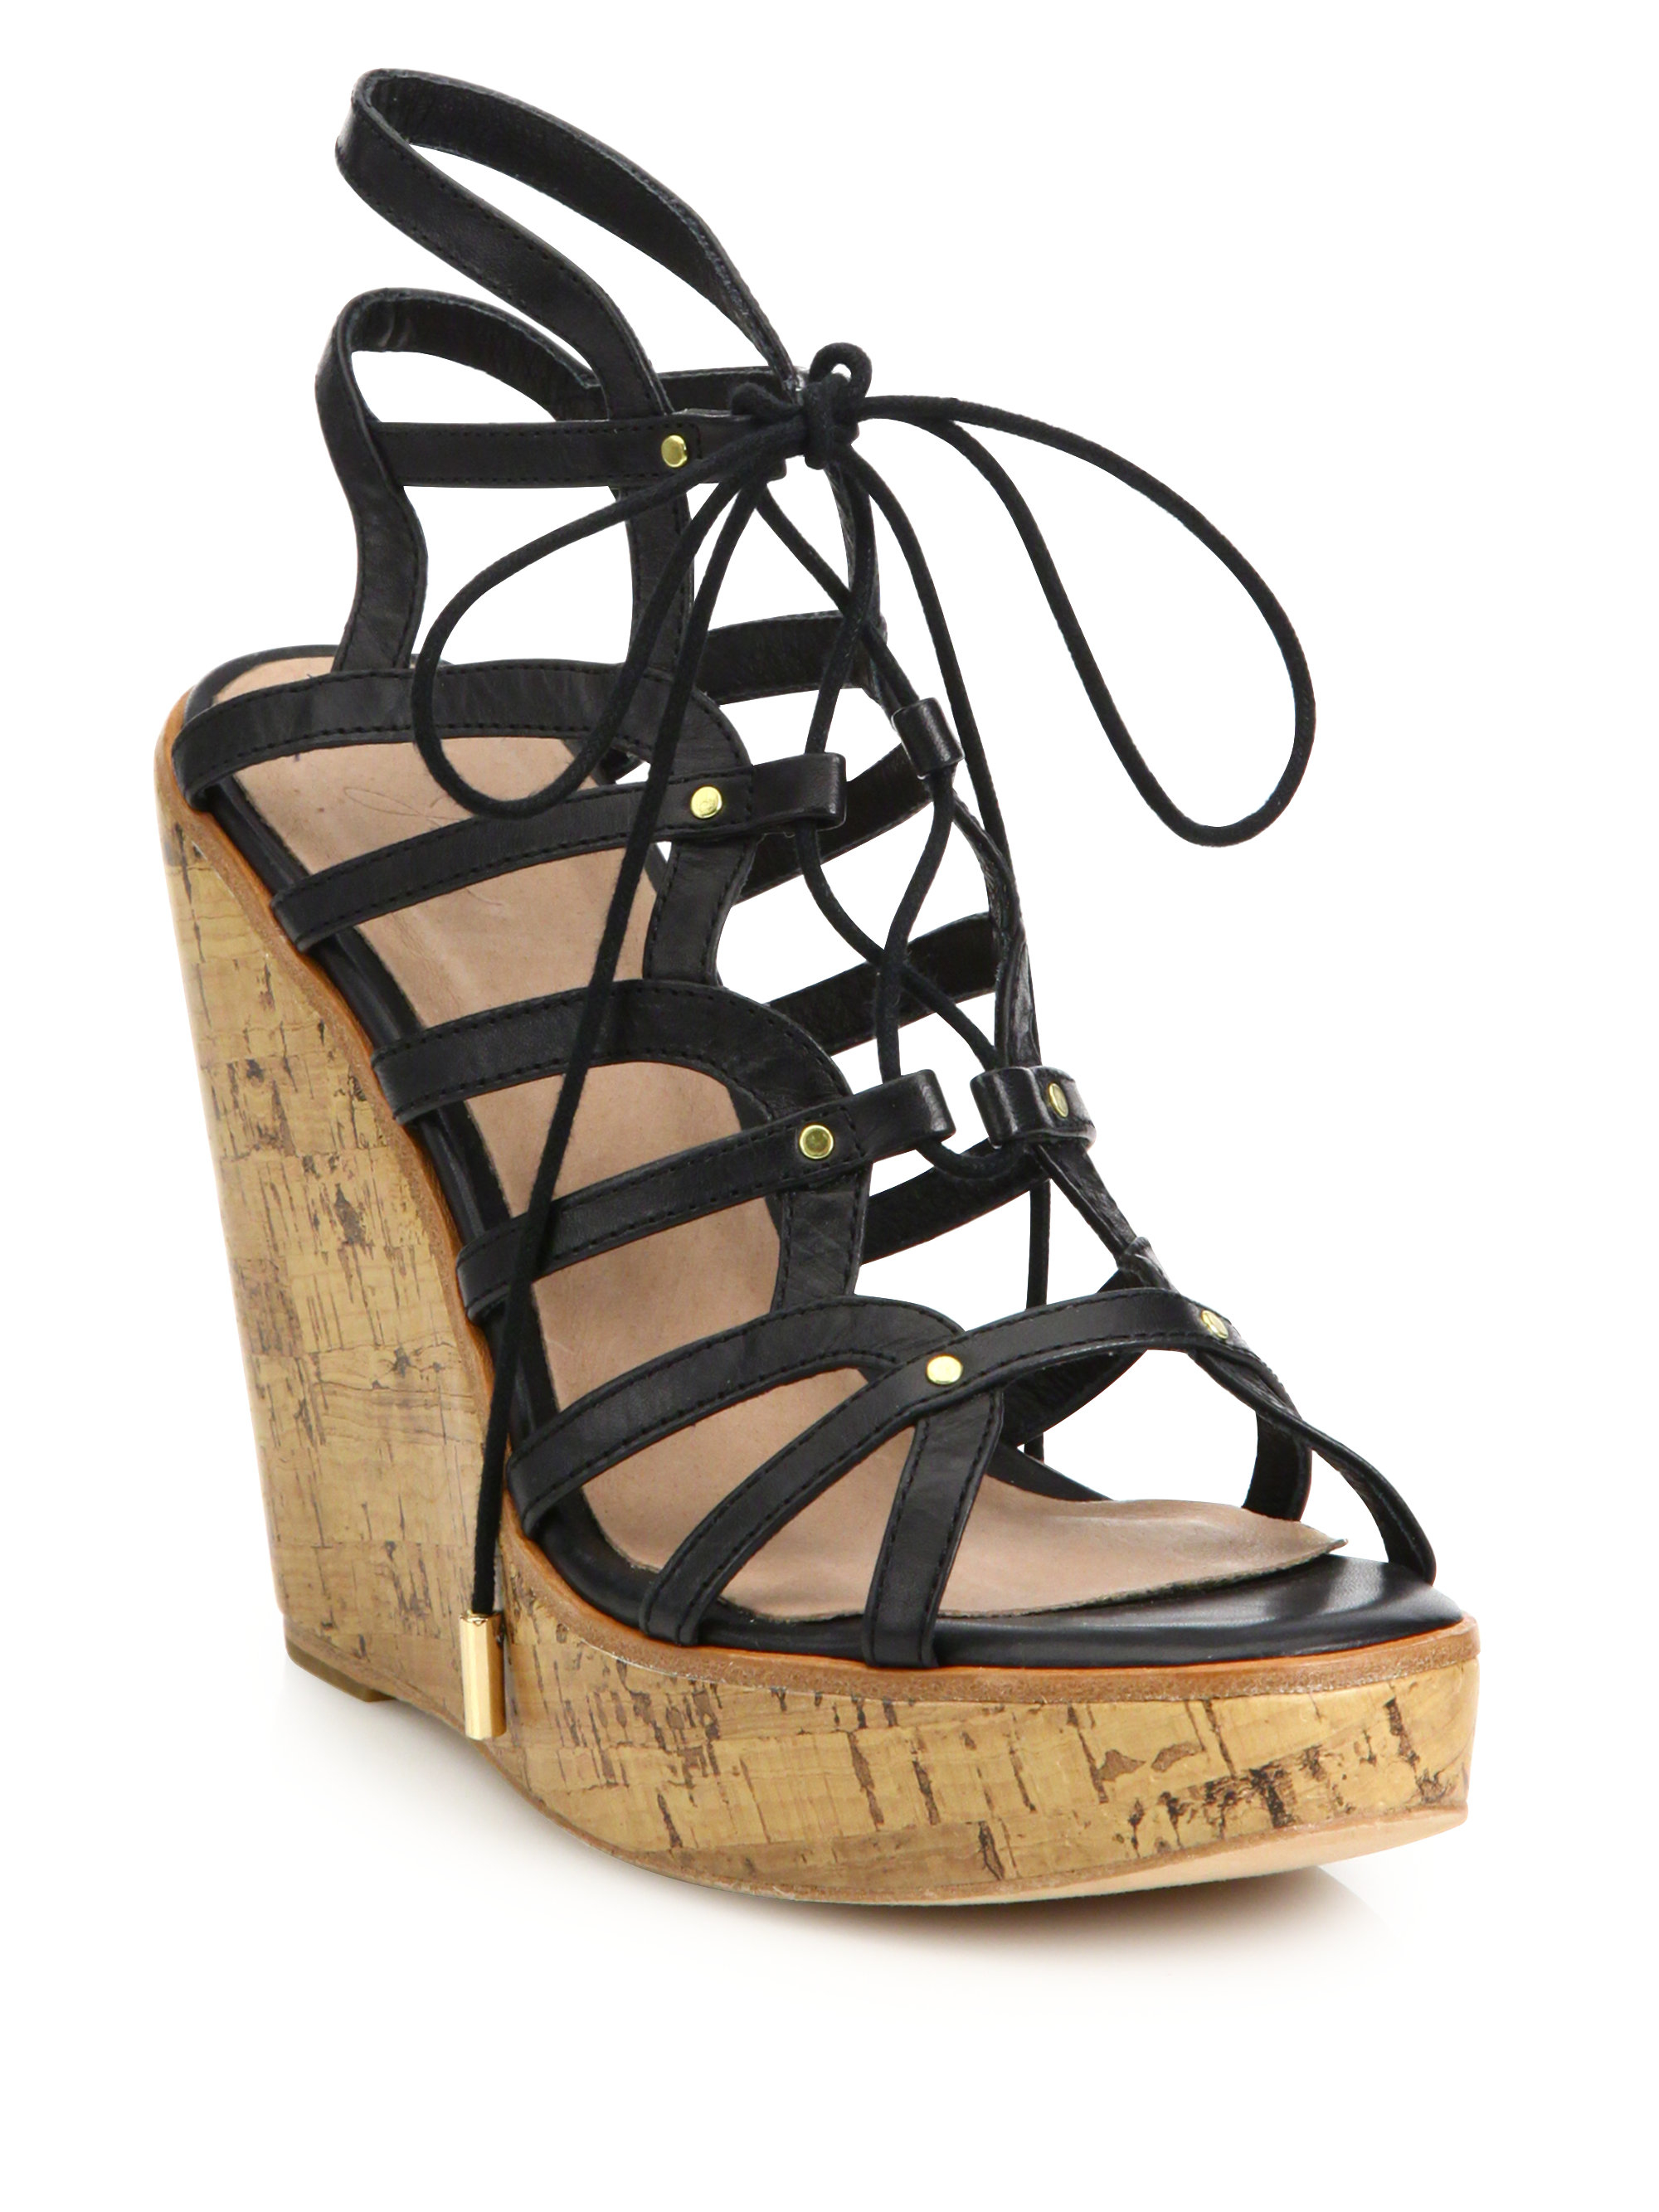 512027b36889 Lyst - Joie  larissa  Platform Wedge Sandal in Black